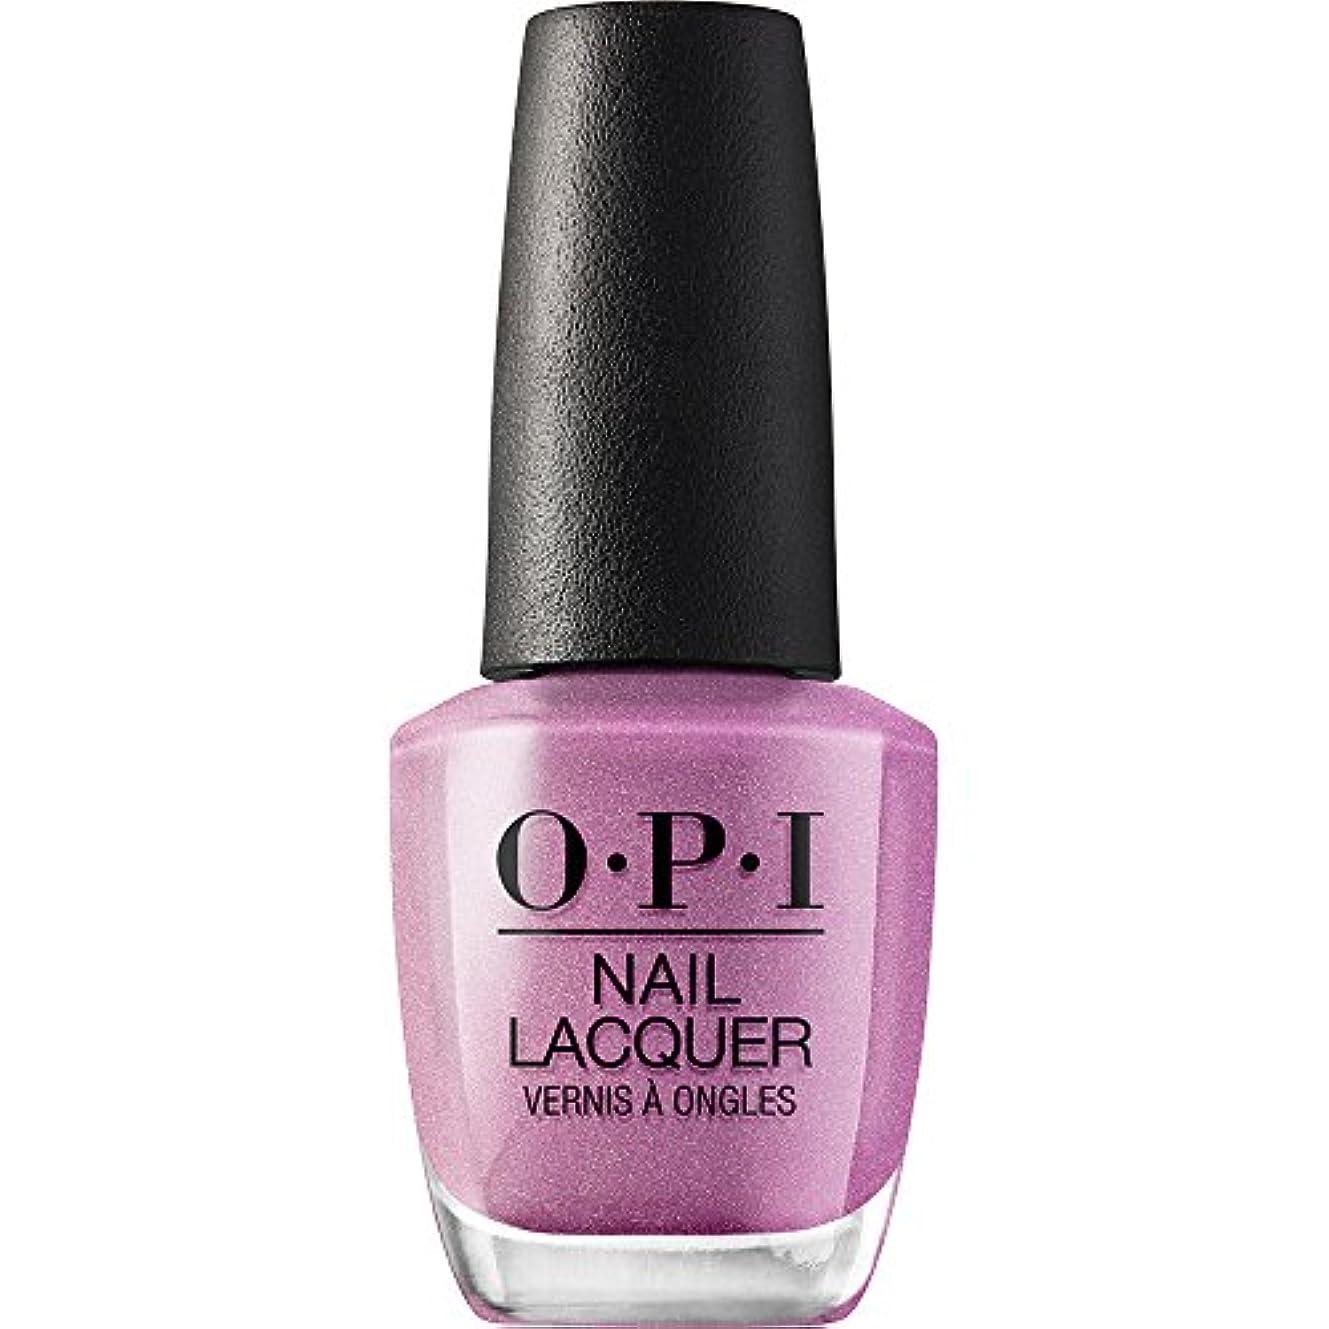 OPI(オーピーアイ) NLB28 シグニフィカント アザー カラー